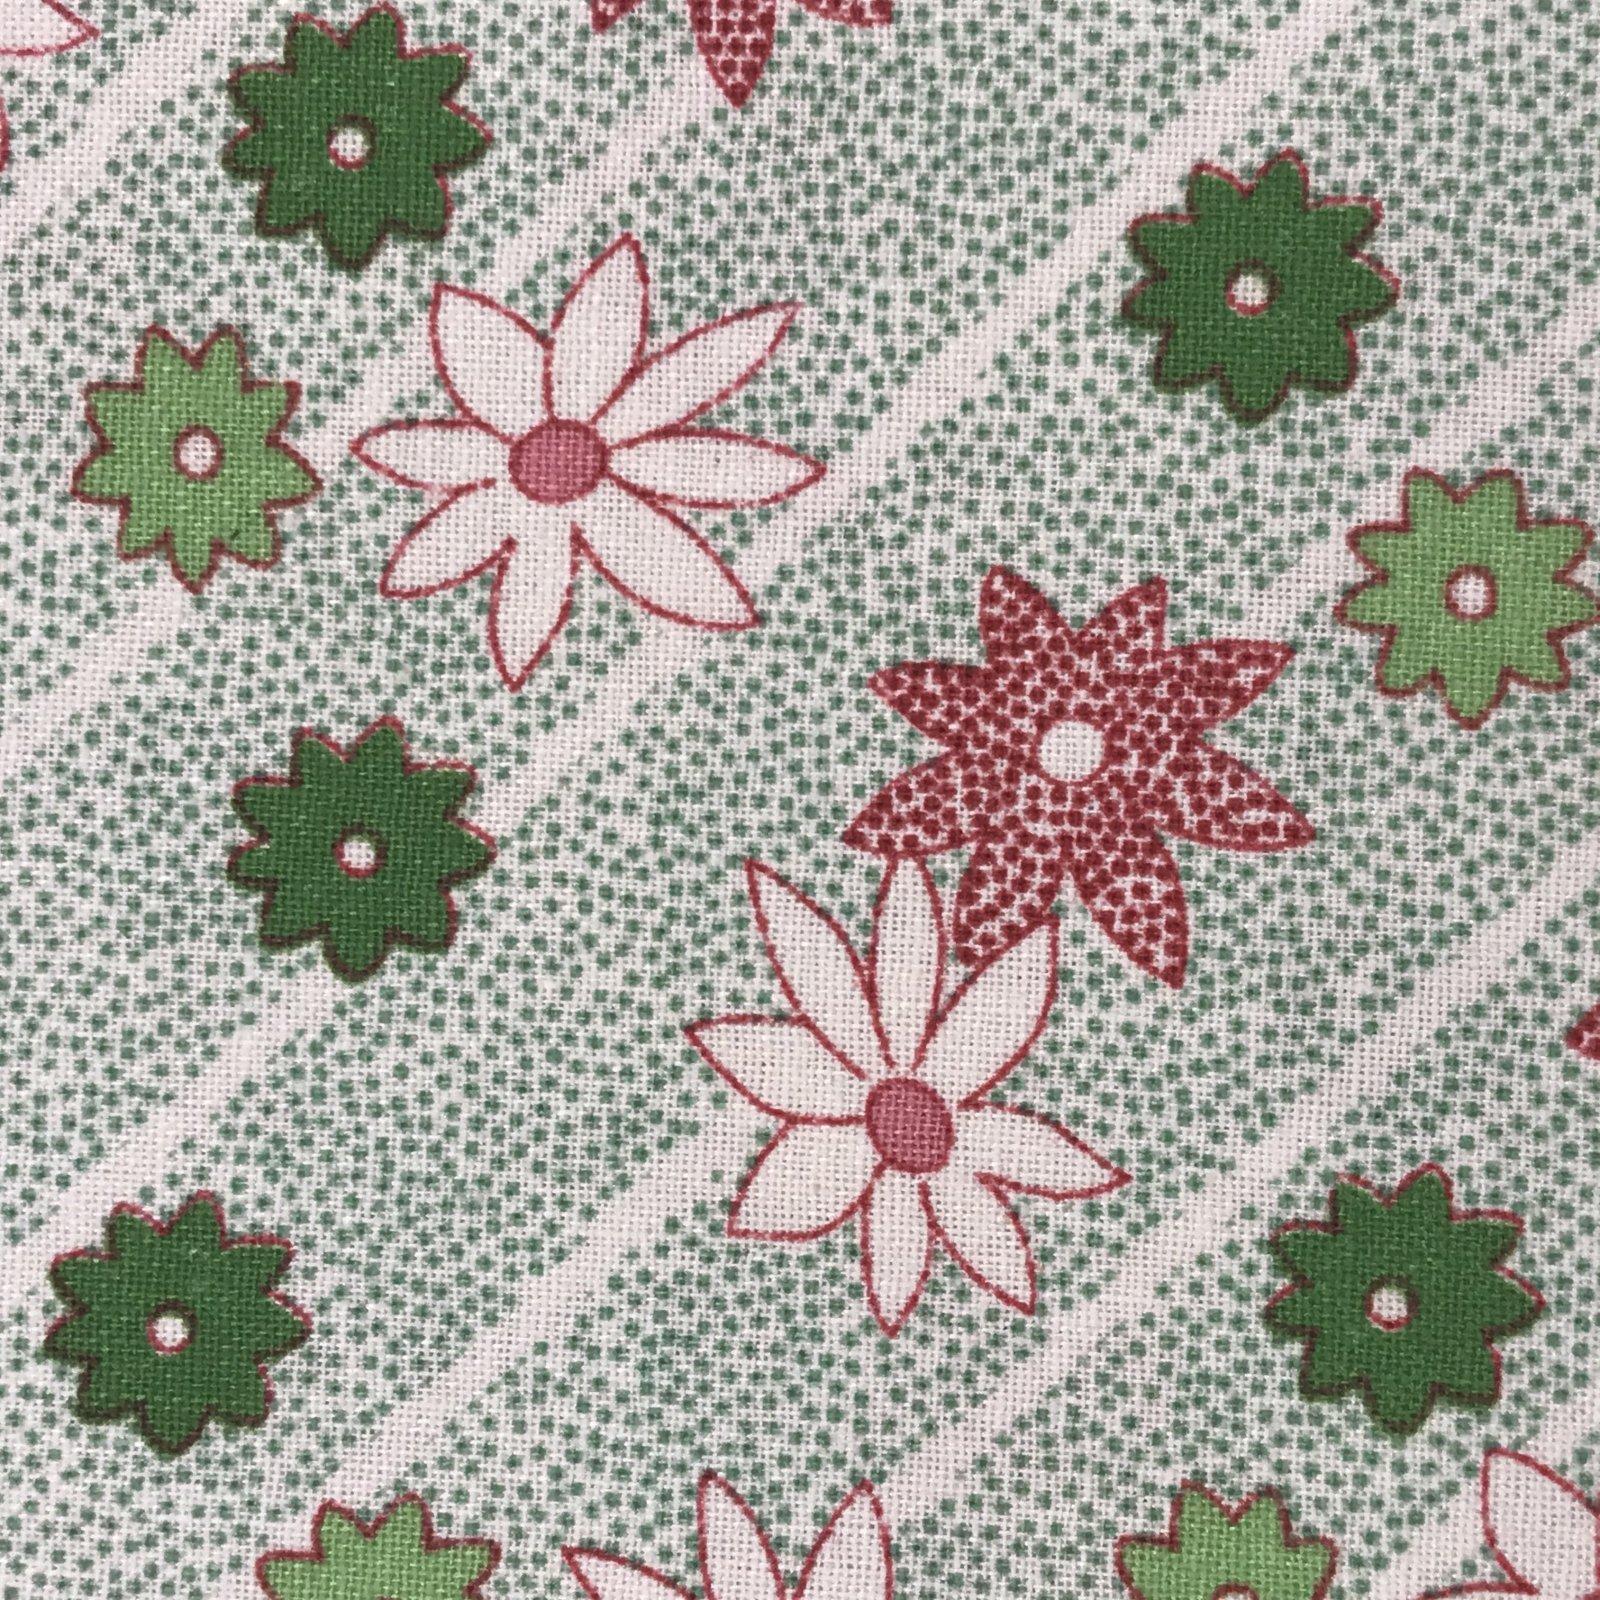 Greetings - Poinsettias on Green Stripes